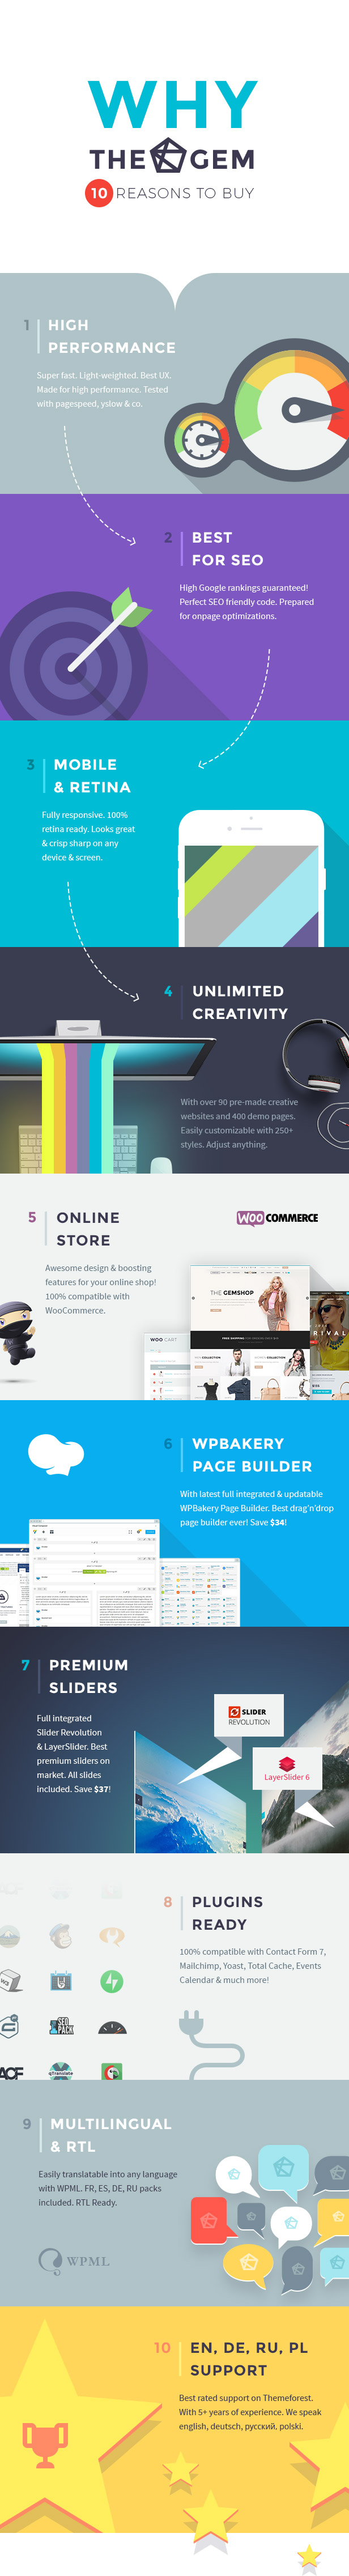 2 new 200 1 - TheGem - Creative Multi-Purpose High-Performance WordPress Theme